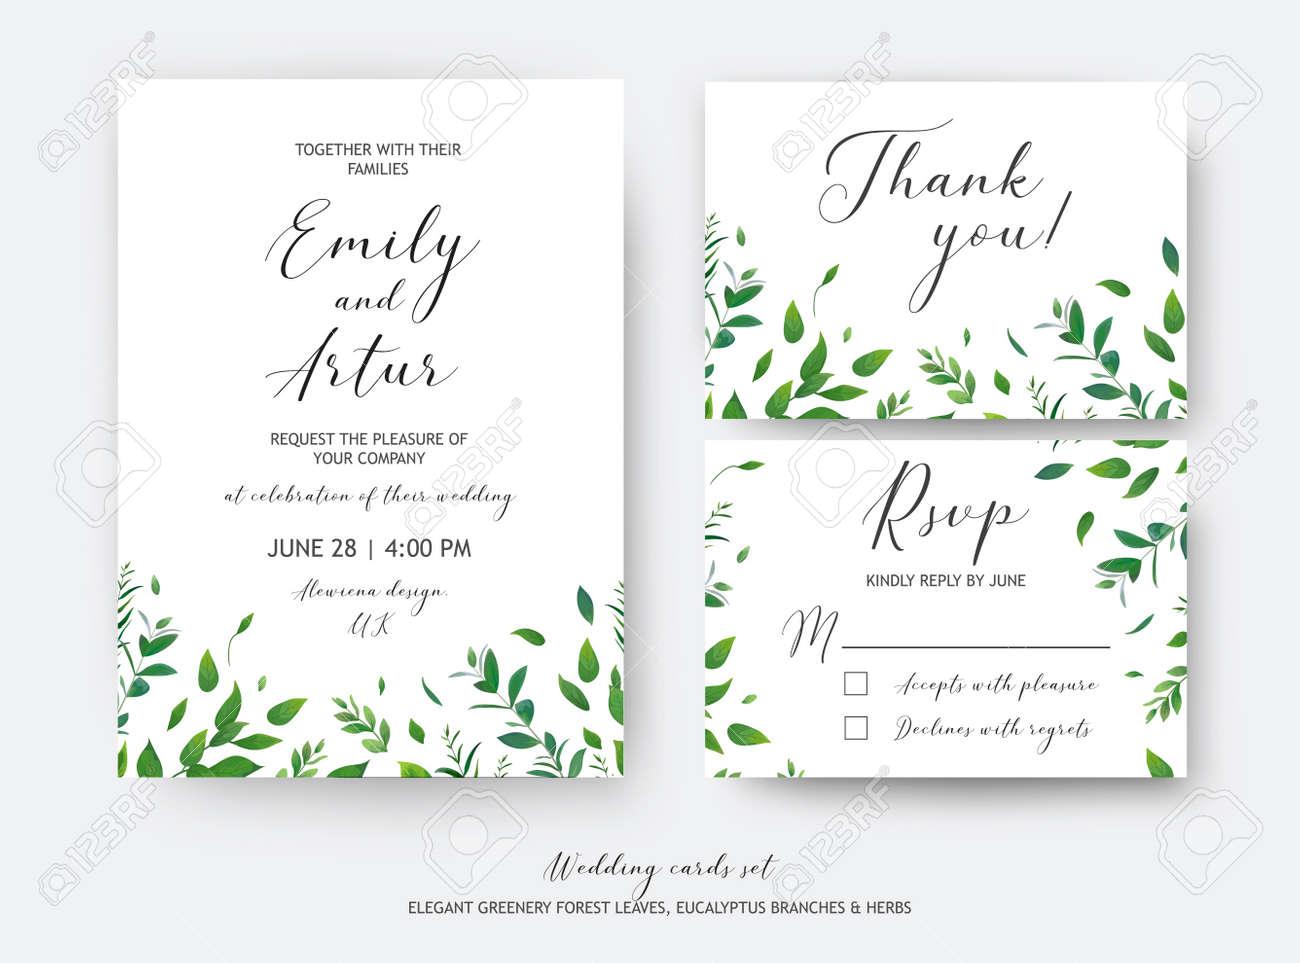 Wedding Invite, Invitation, RSVP, Thank You Cards Vector Art ...